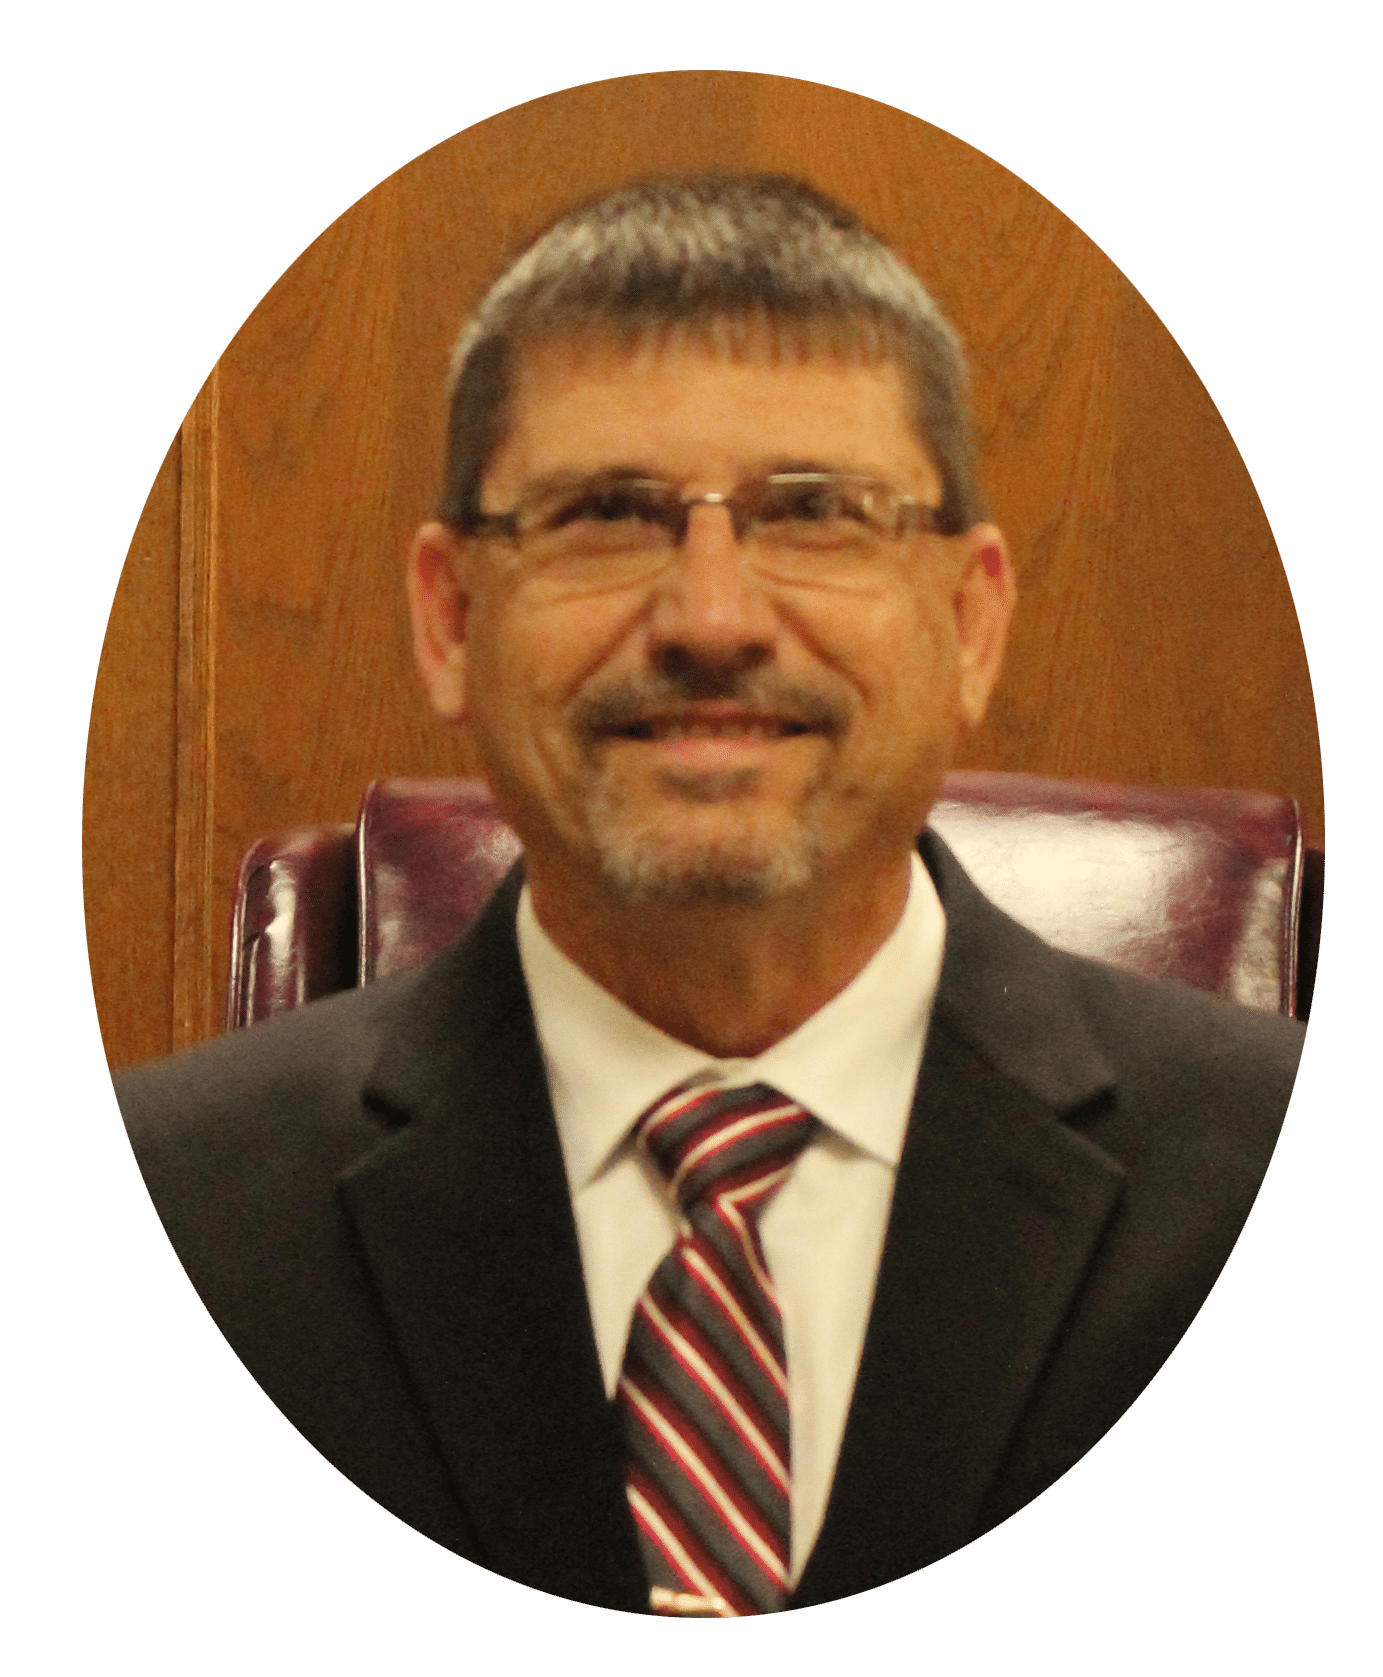 Randy W. Atkinson, Sheriff, Leake County, Mississippi